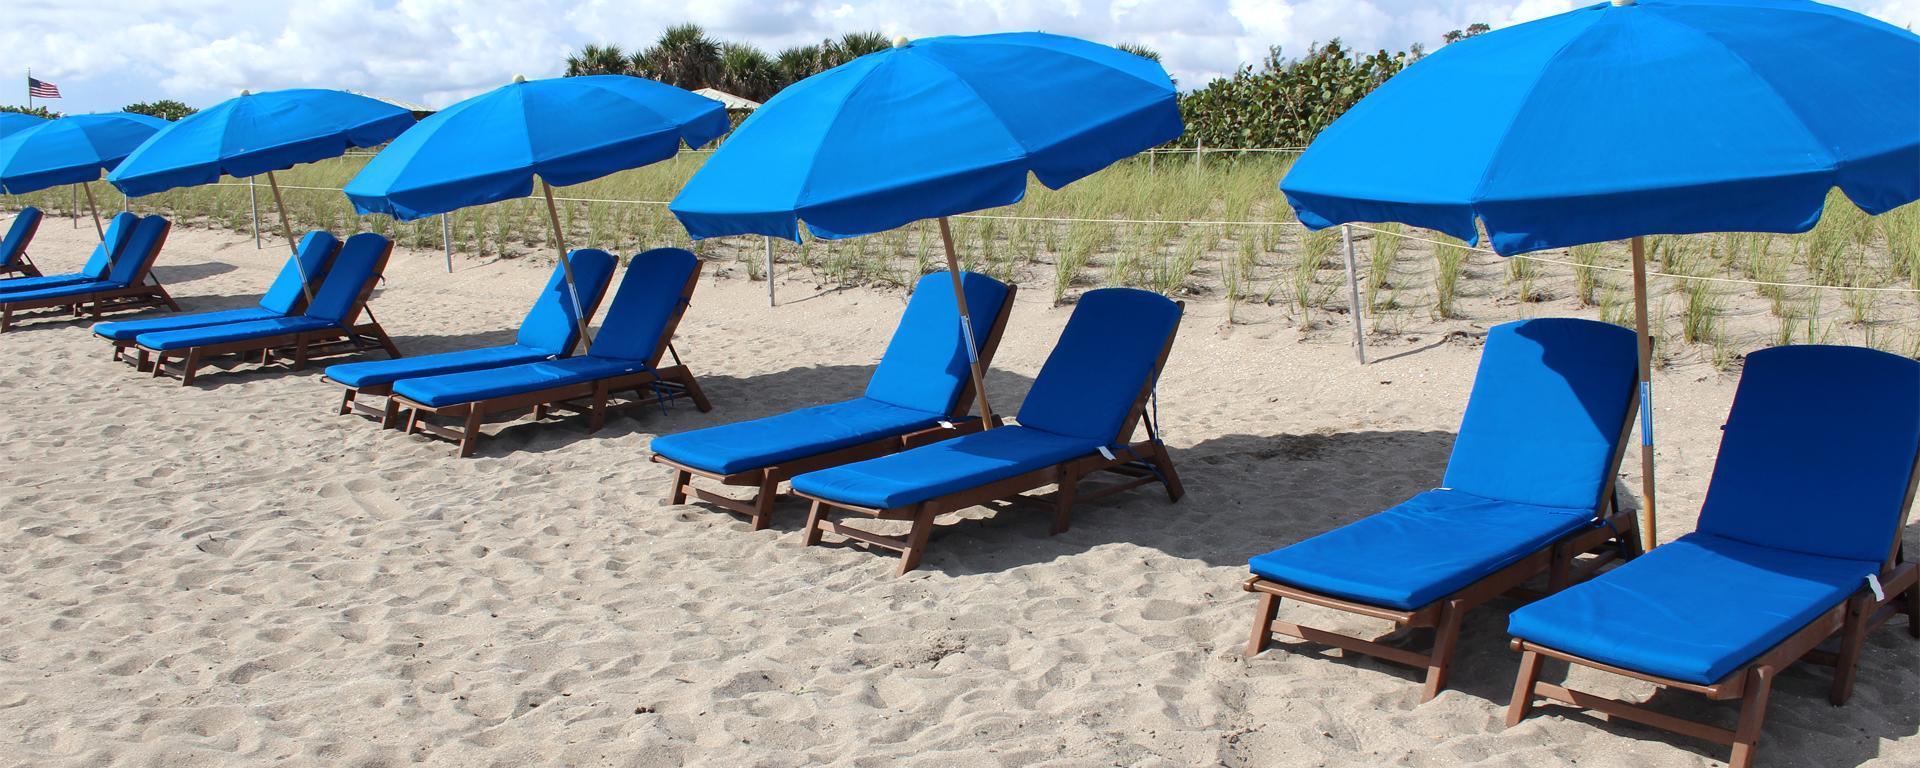 Beach Chair Rentals at Jensen Beach | Martin County Florida